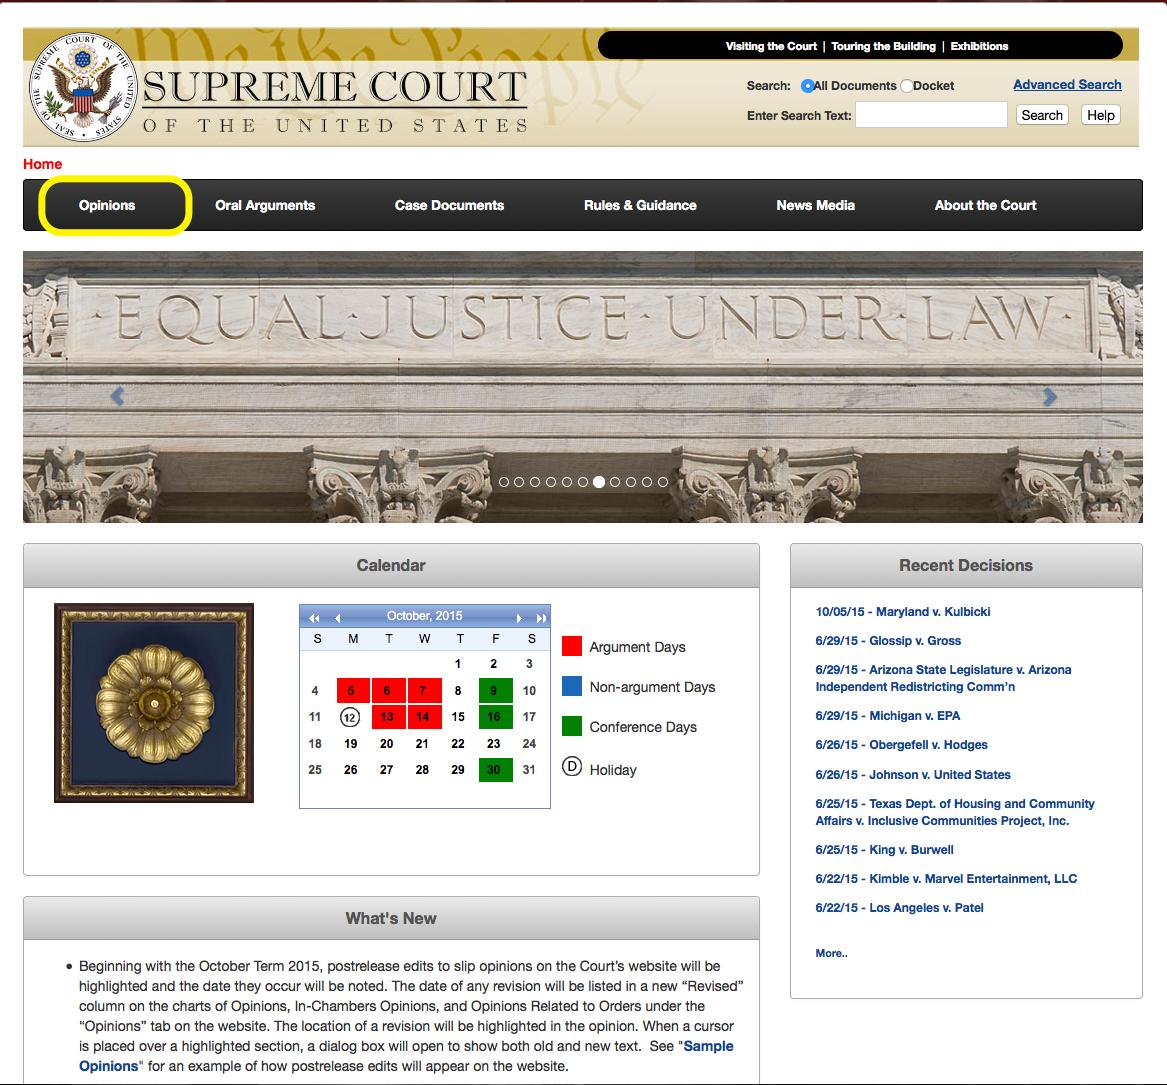 Supreme Court Home Page